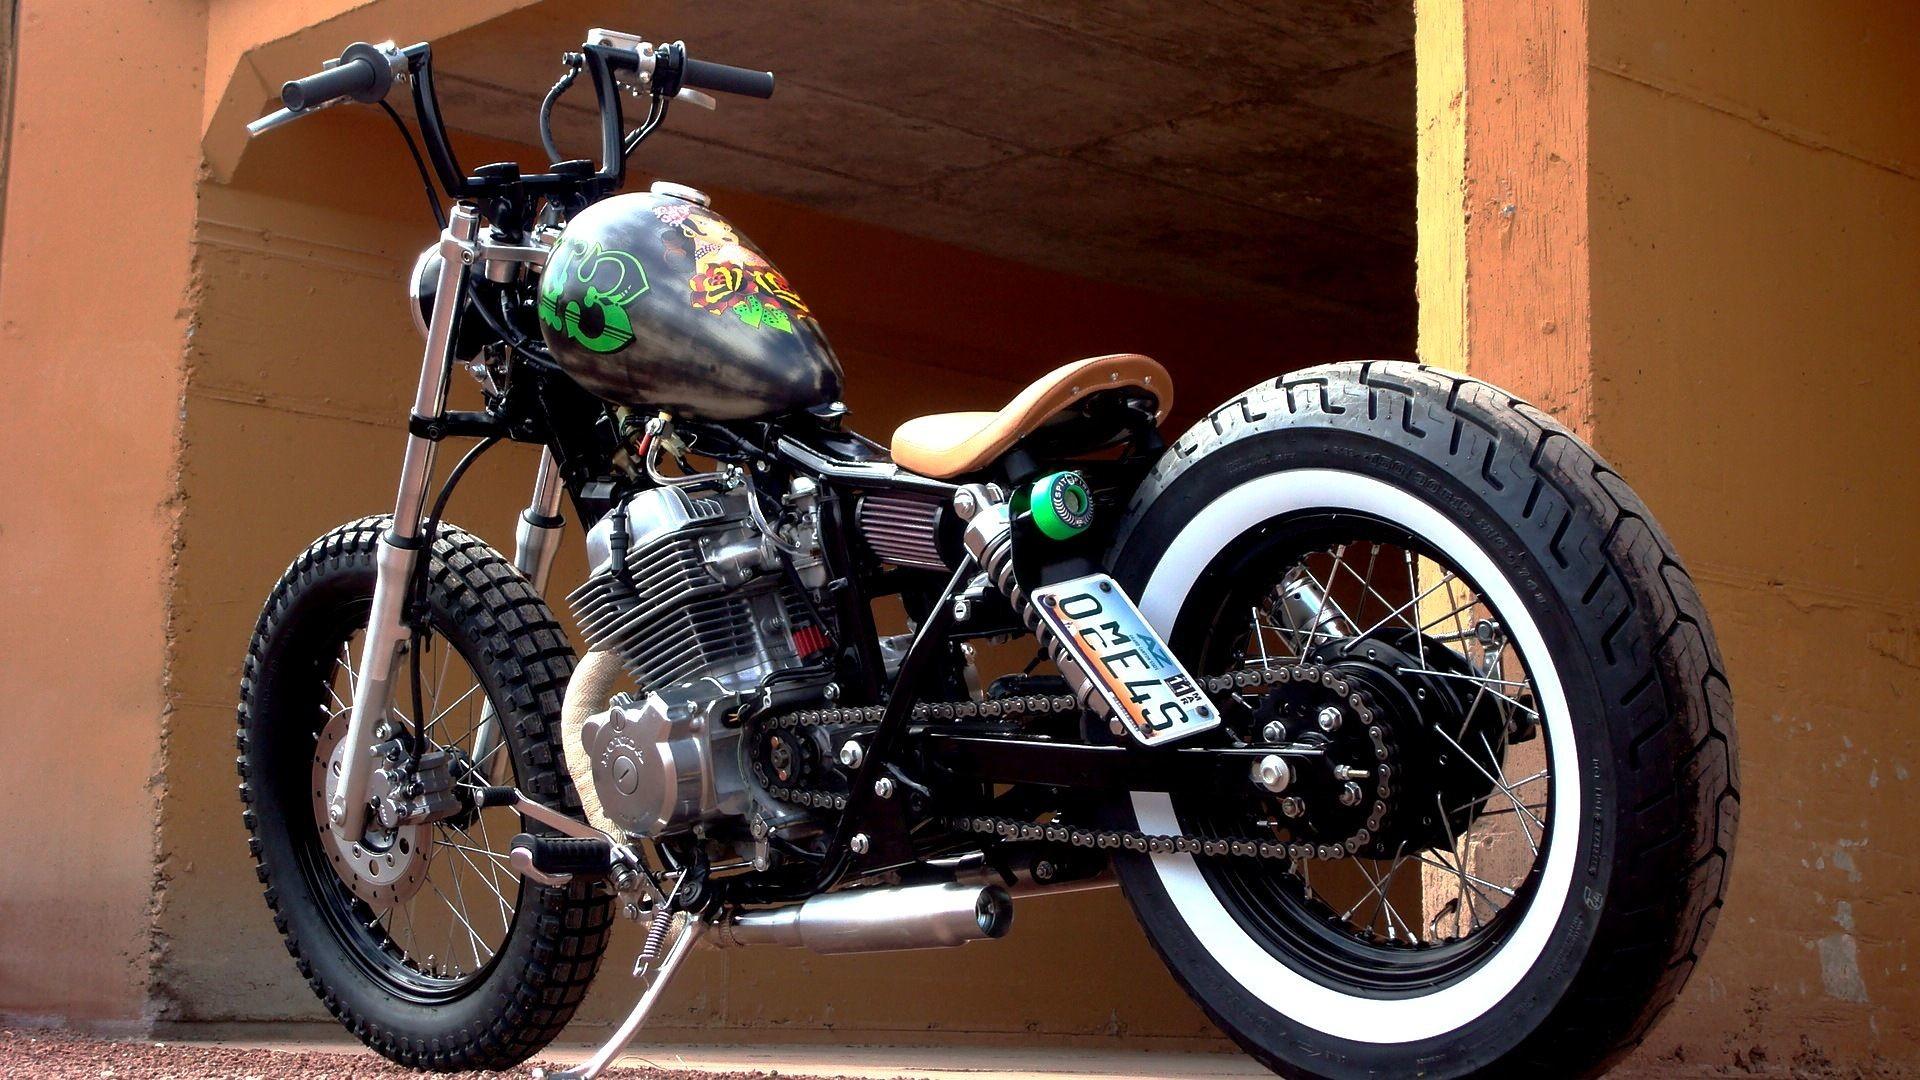 Res: 1920x1080, #honda#rebel#bobber#motorcycle